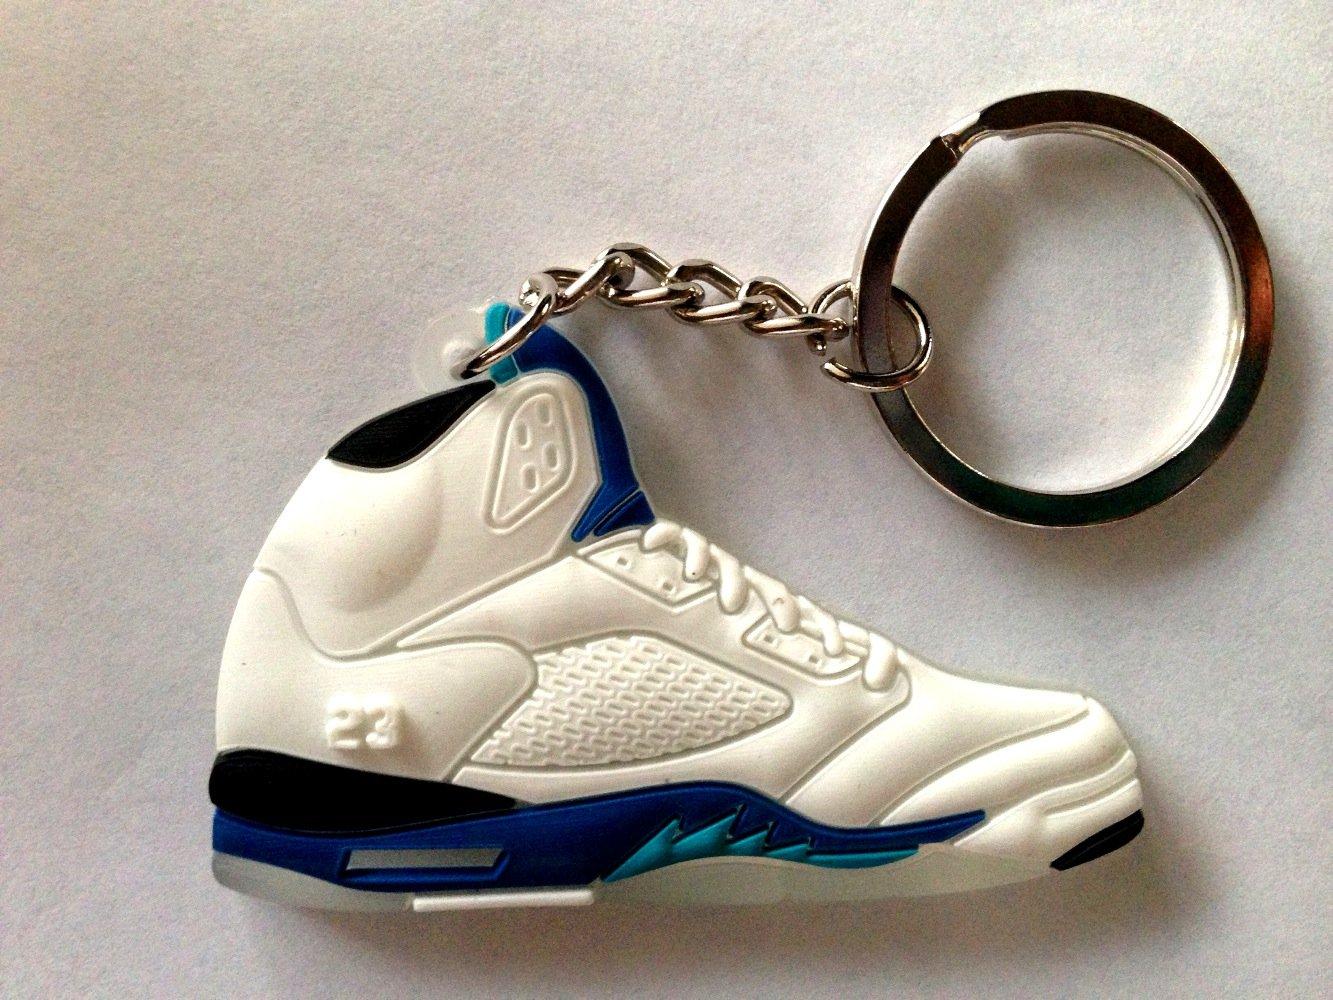 33832c2eb93381 Get Quotations · Air Jordan V 5 White Royal Blue Stealth Grape Chicago  Bulls Sneakers Shoes Keychain Keyring